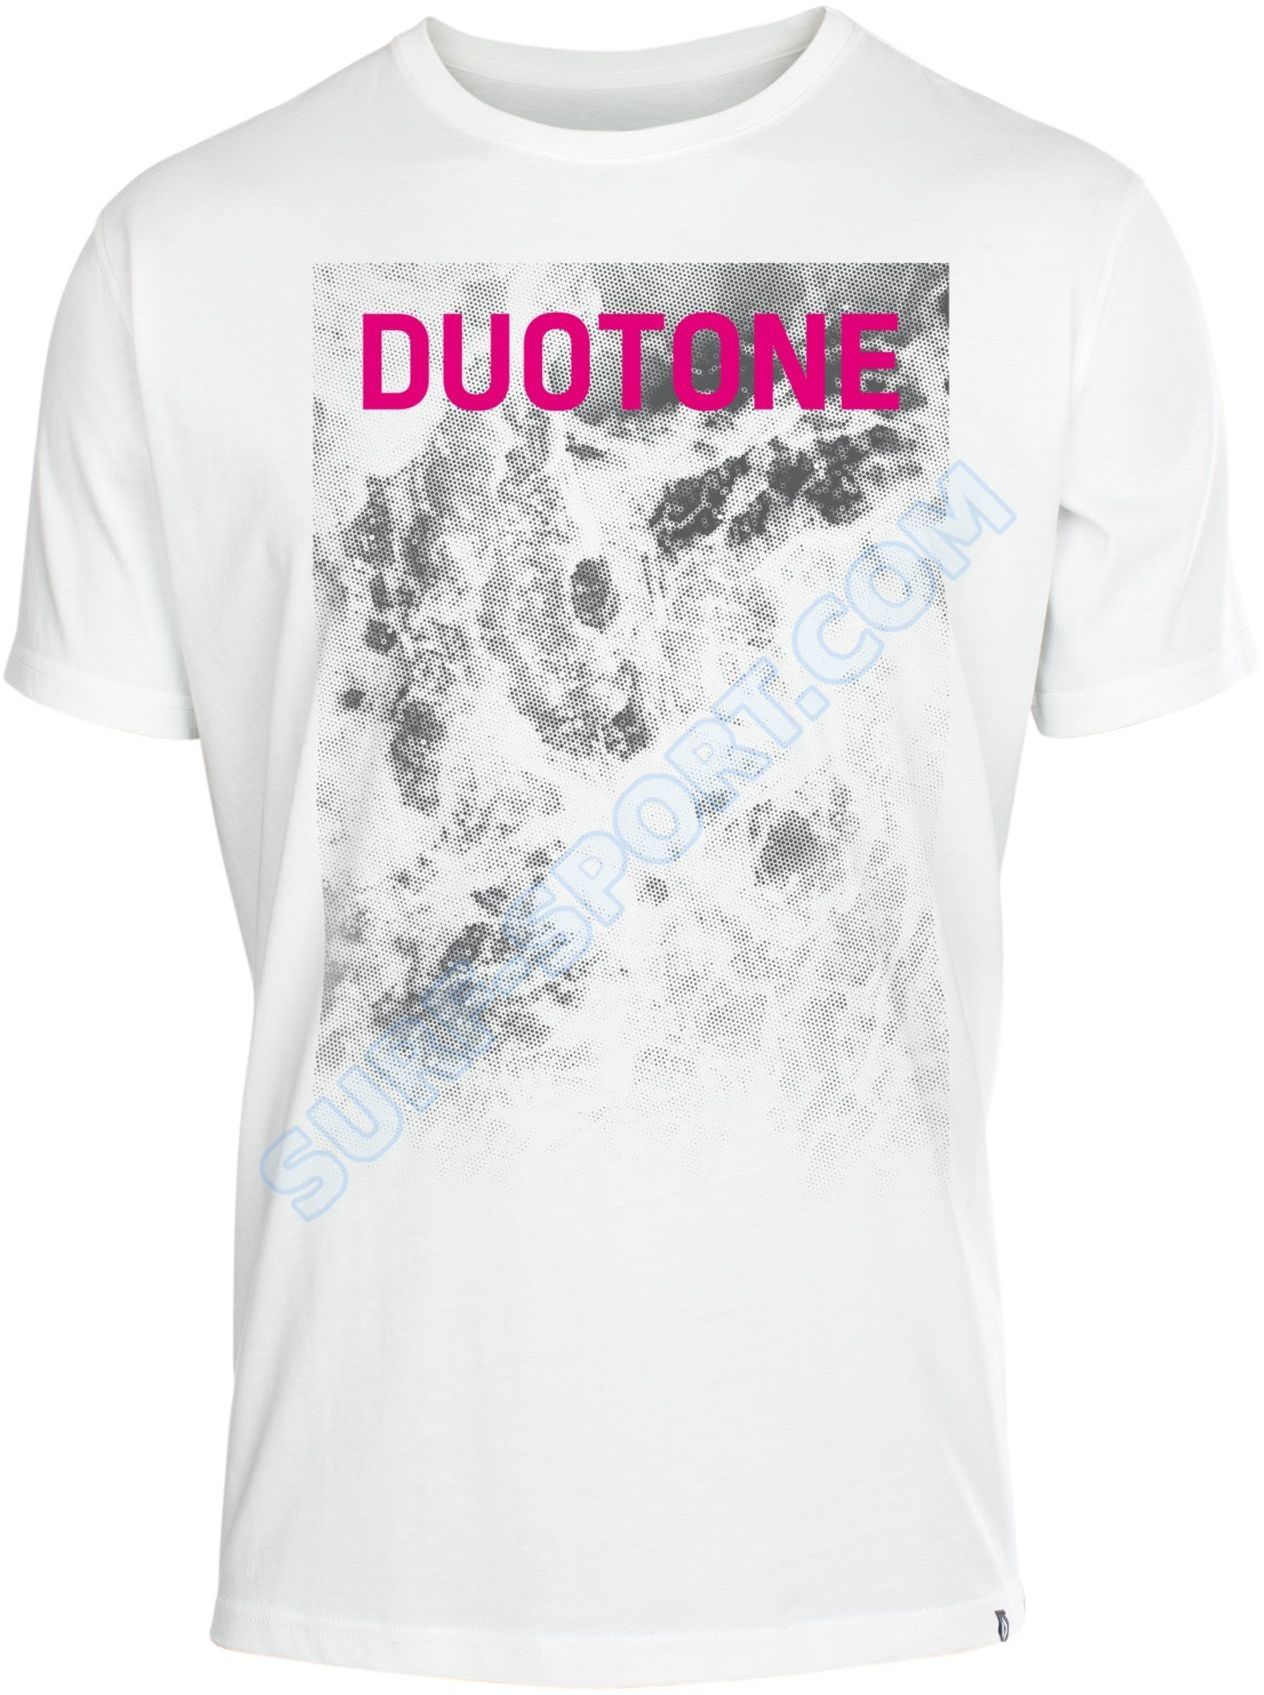 Koszulka Duotone Tee SS Rasterized 2019 White